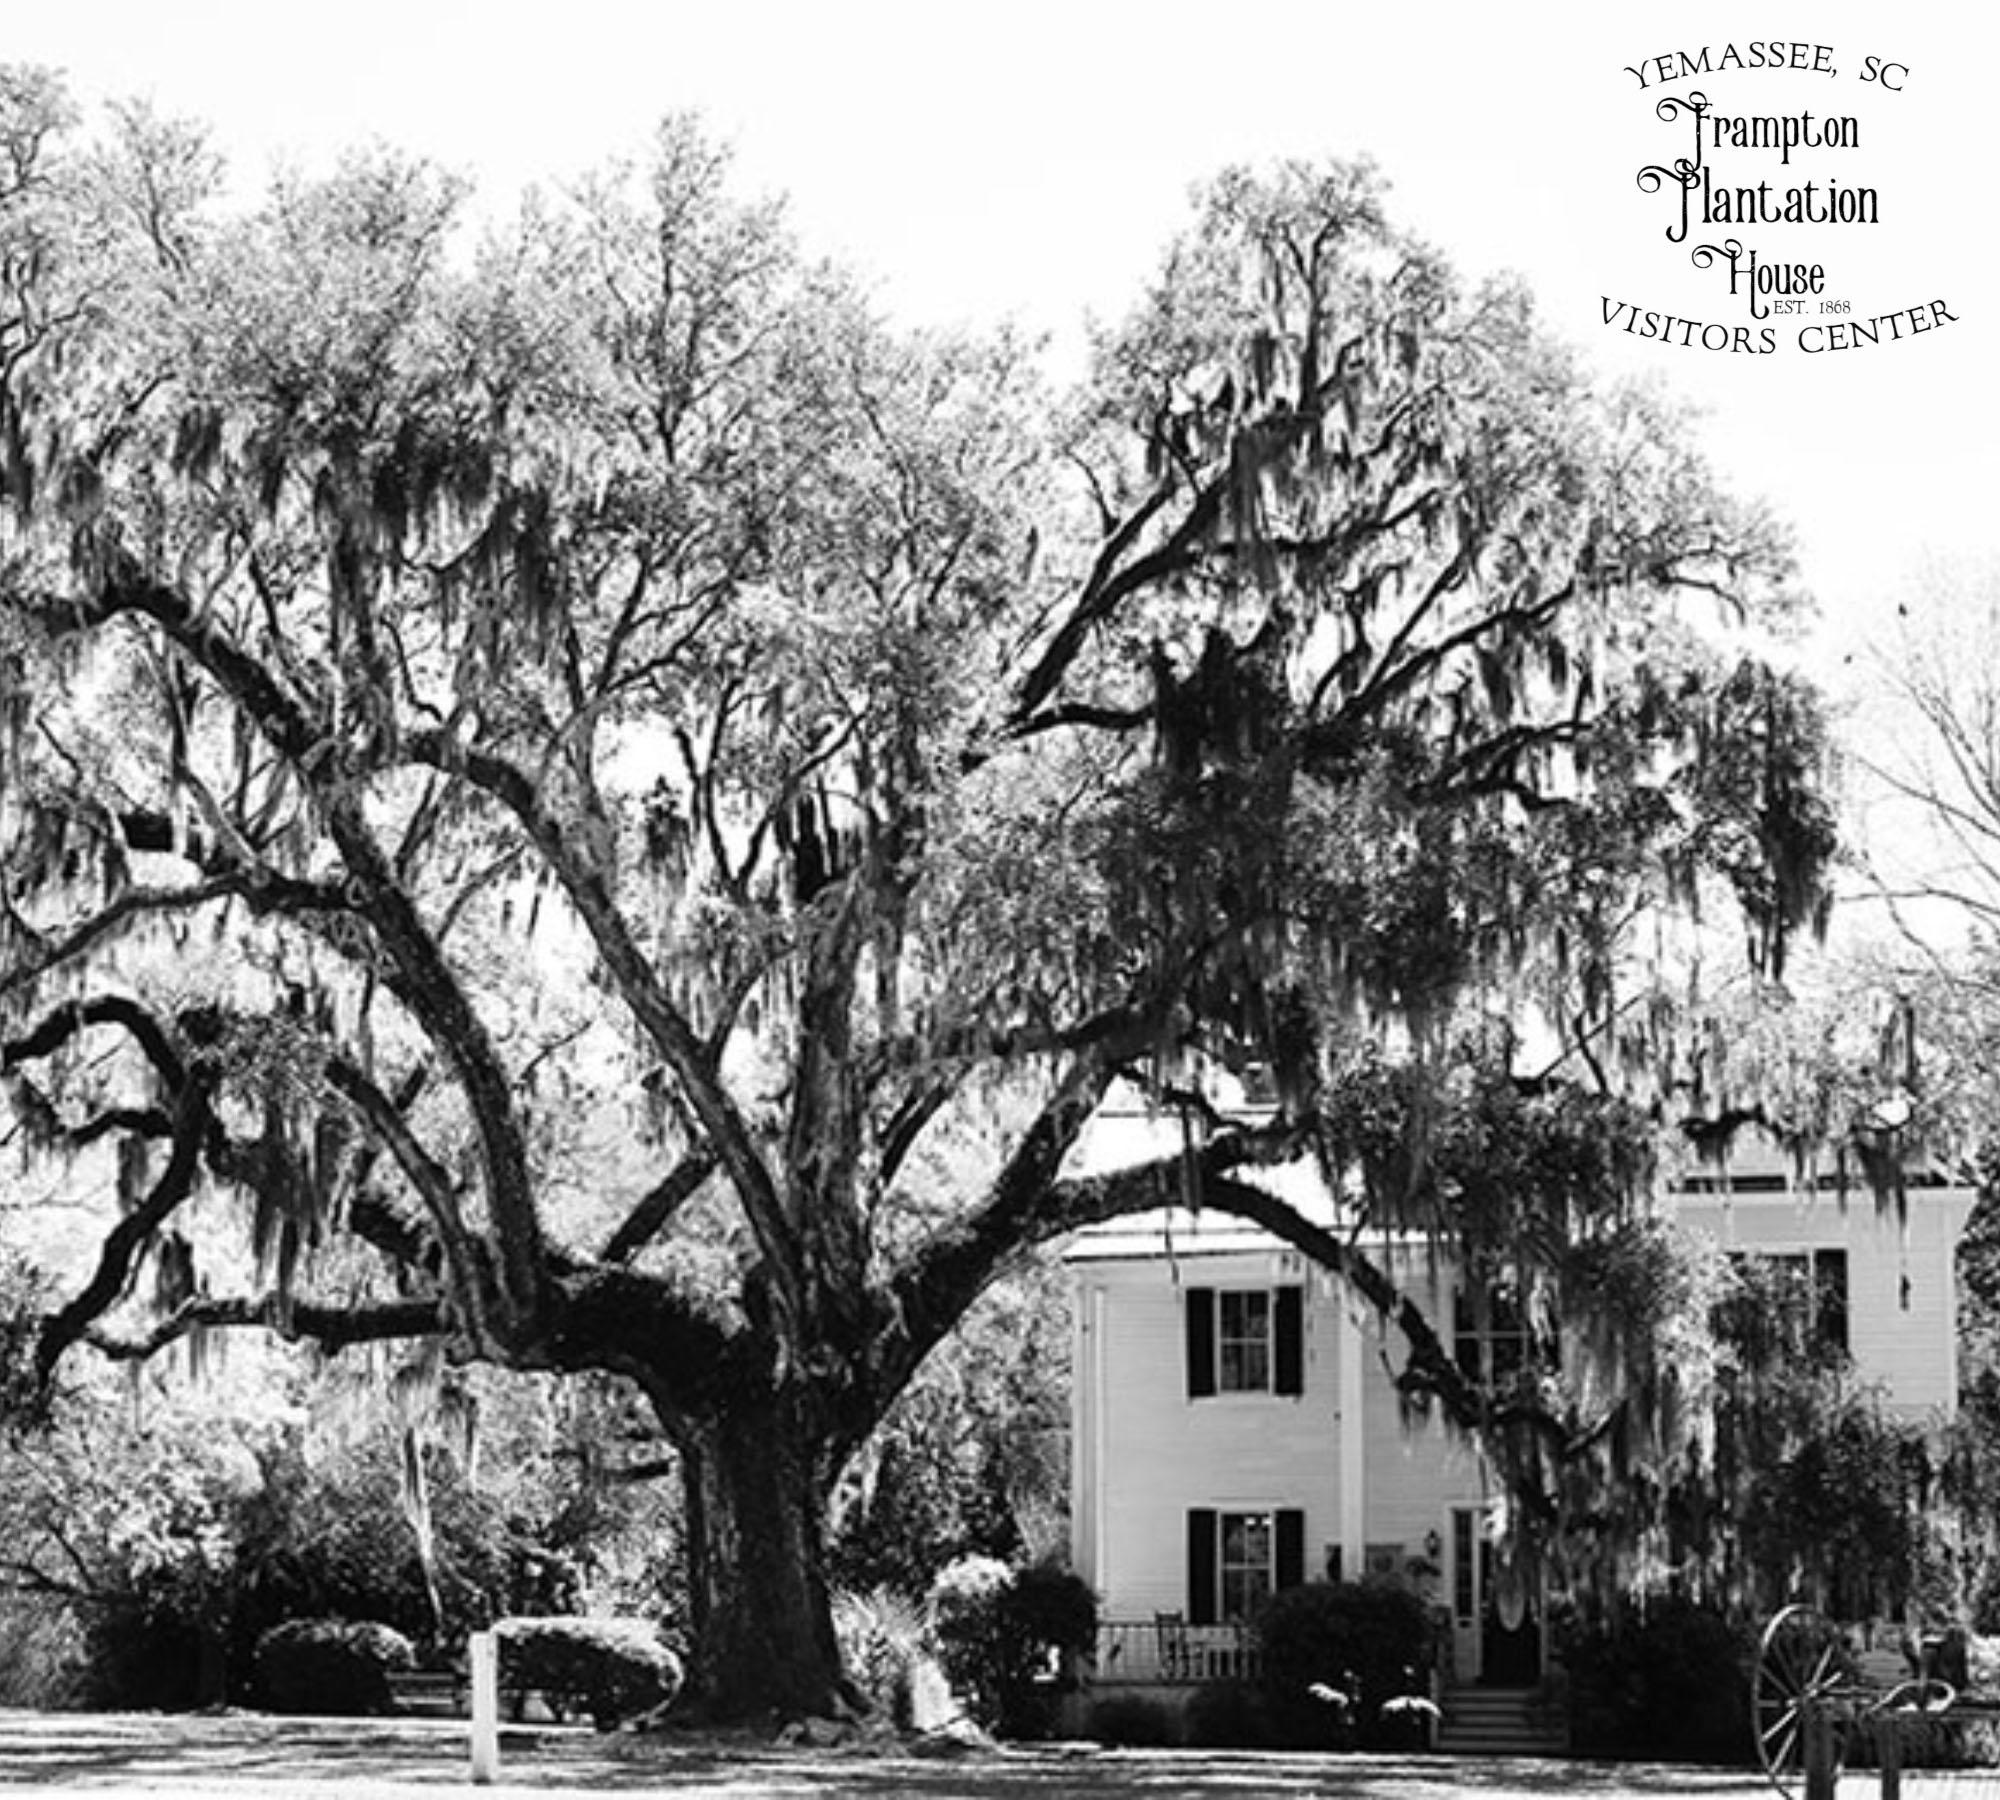 Exterior view of Frampton Plantation House